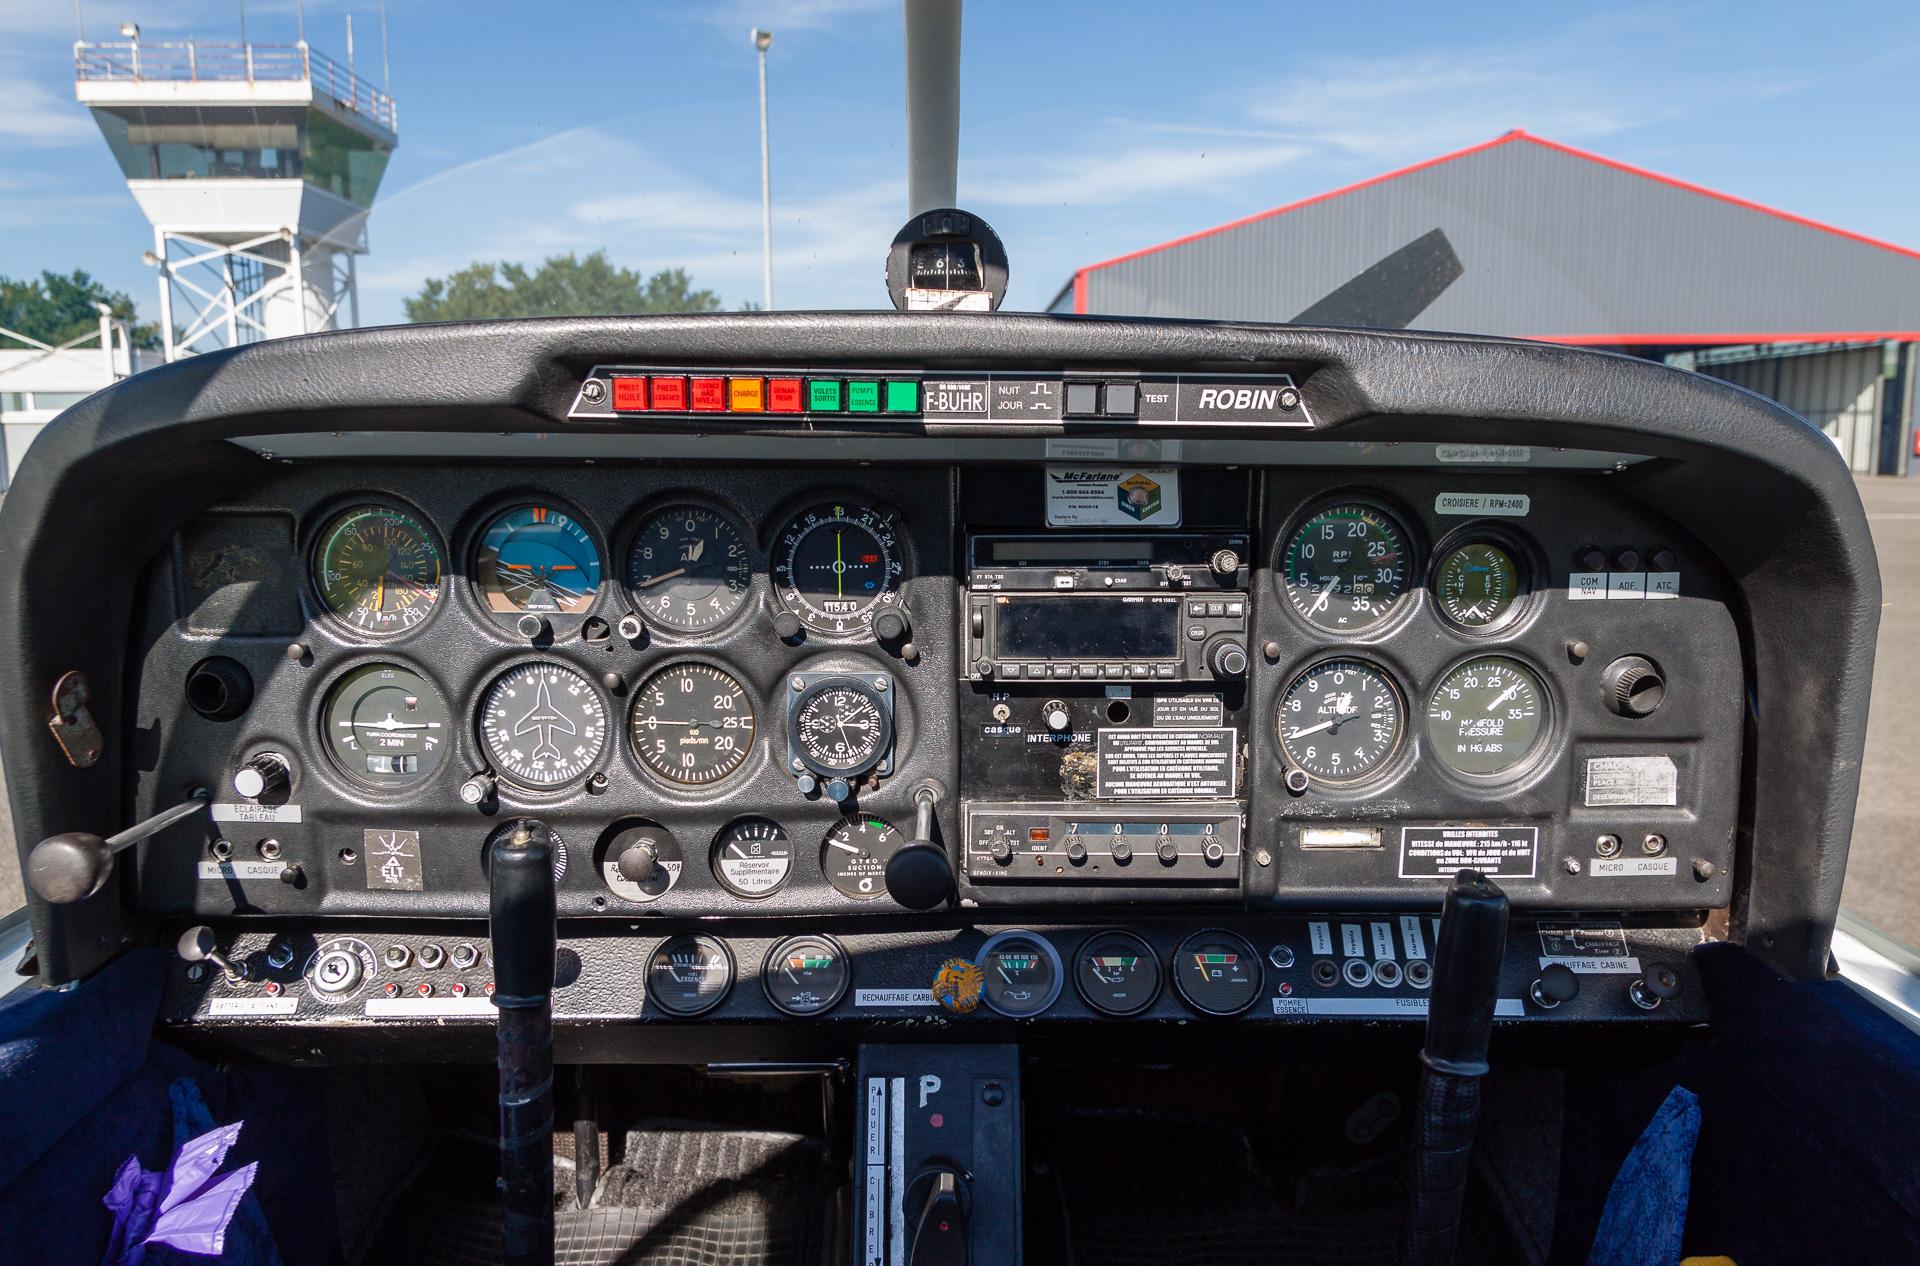 2015-08-30 17-08-58 Aeroclub-2